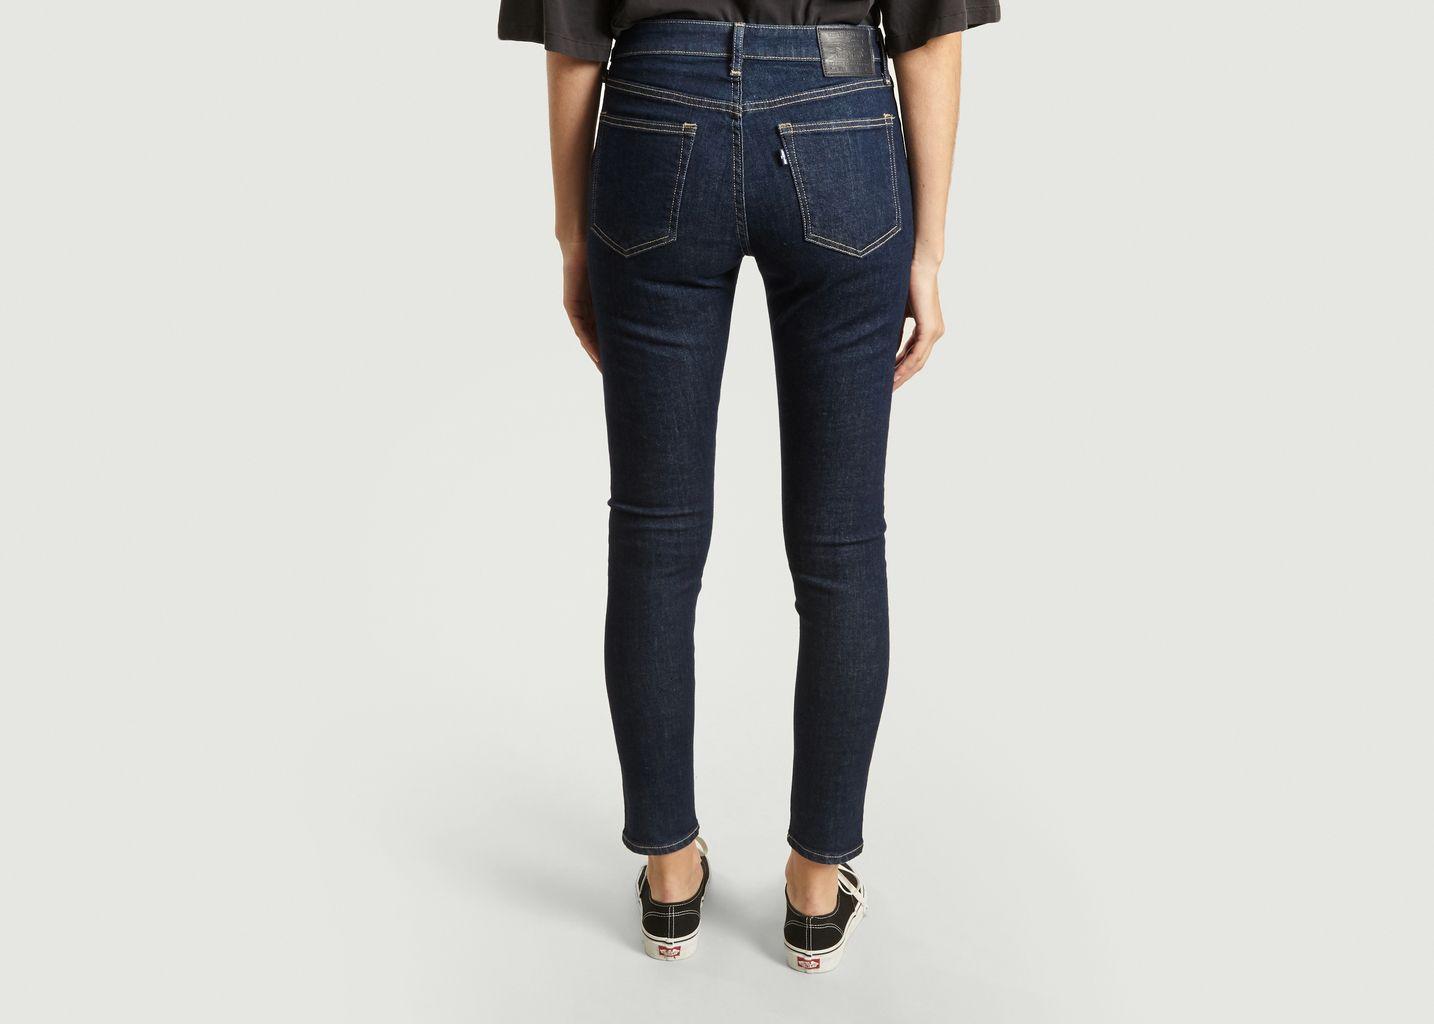 Jean 721 Skinny Fit Taille Haute - Levi's M&C